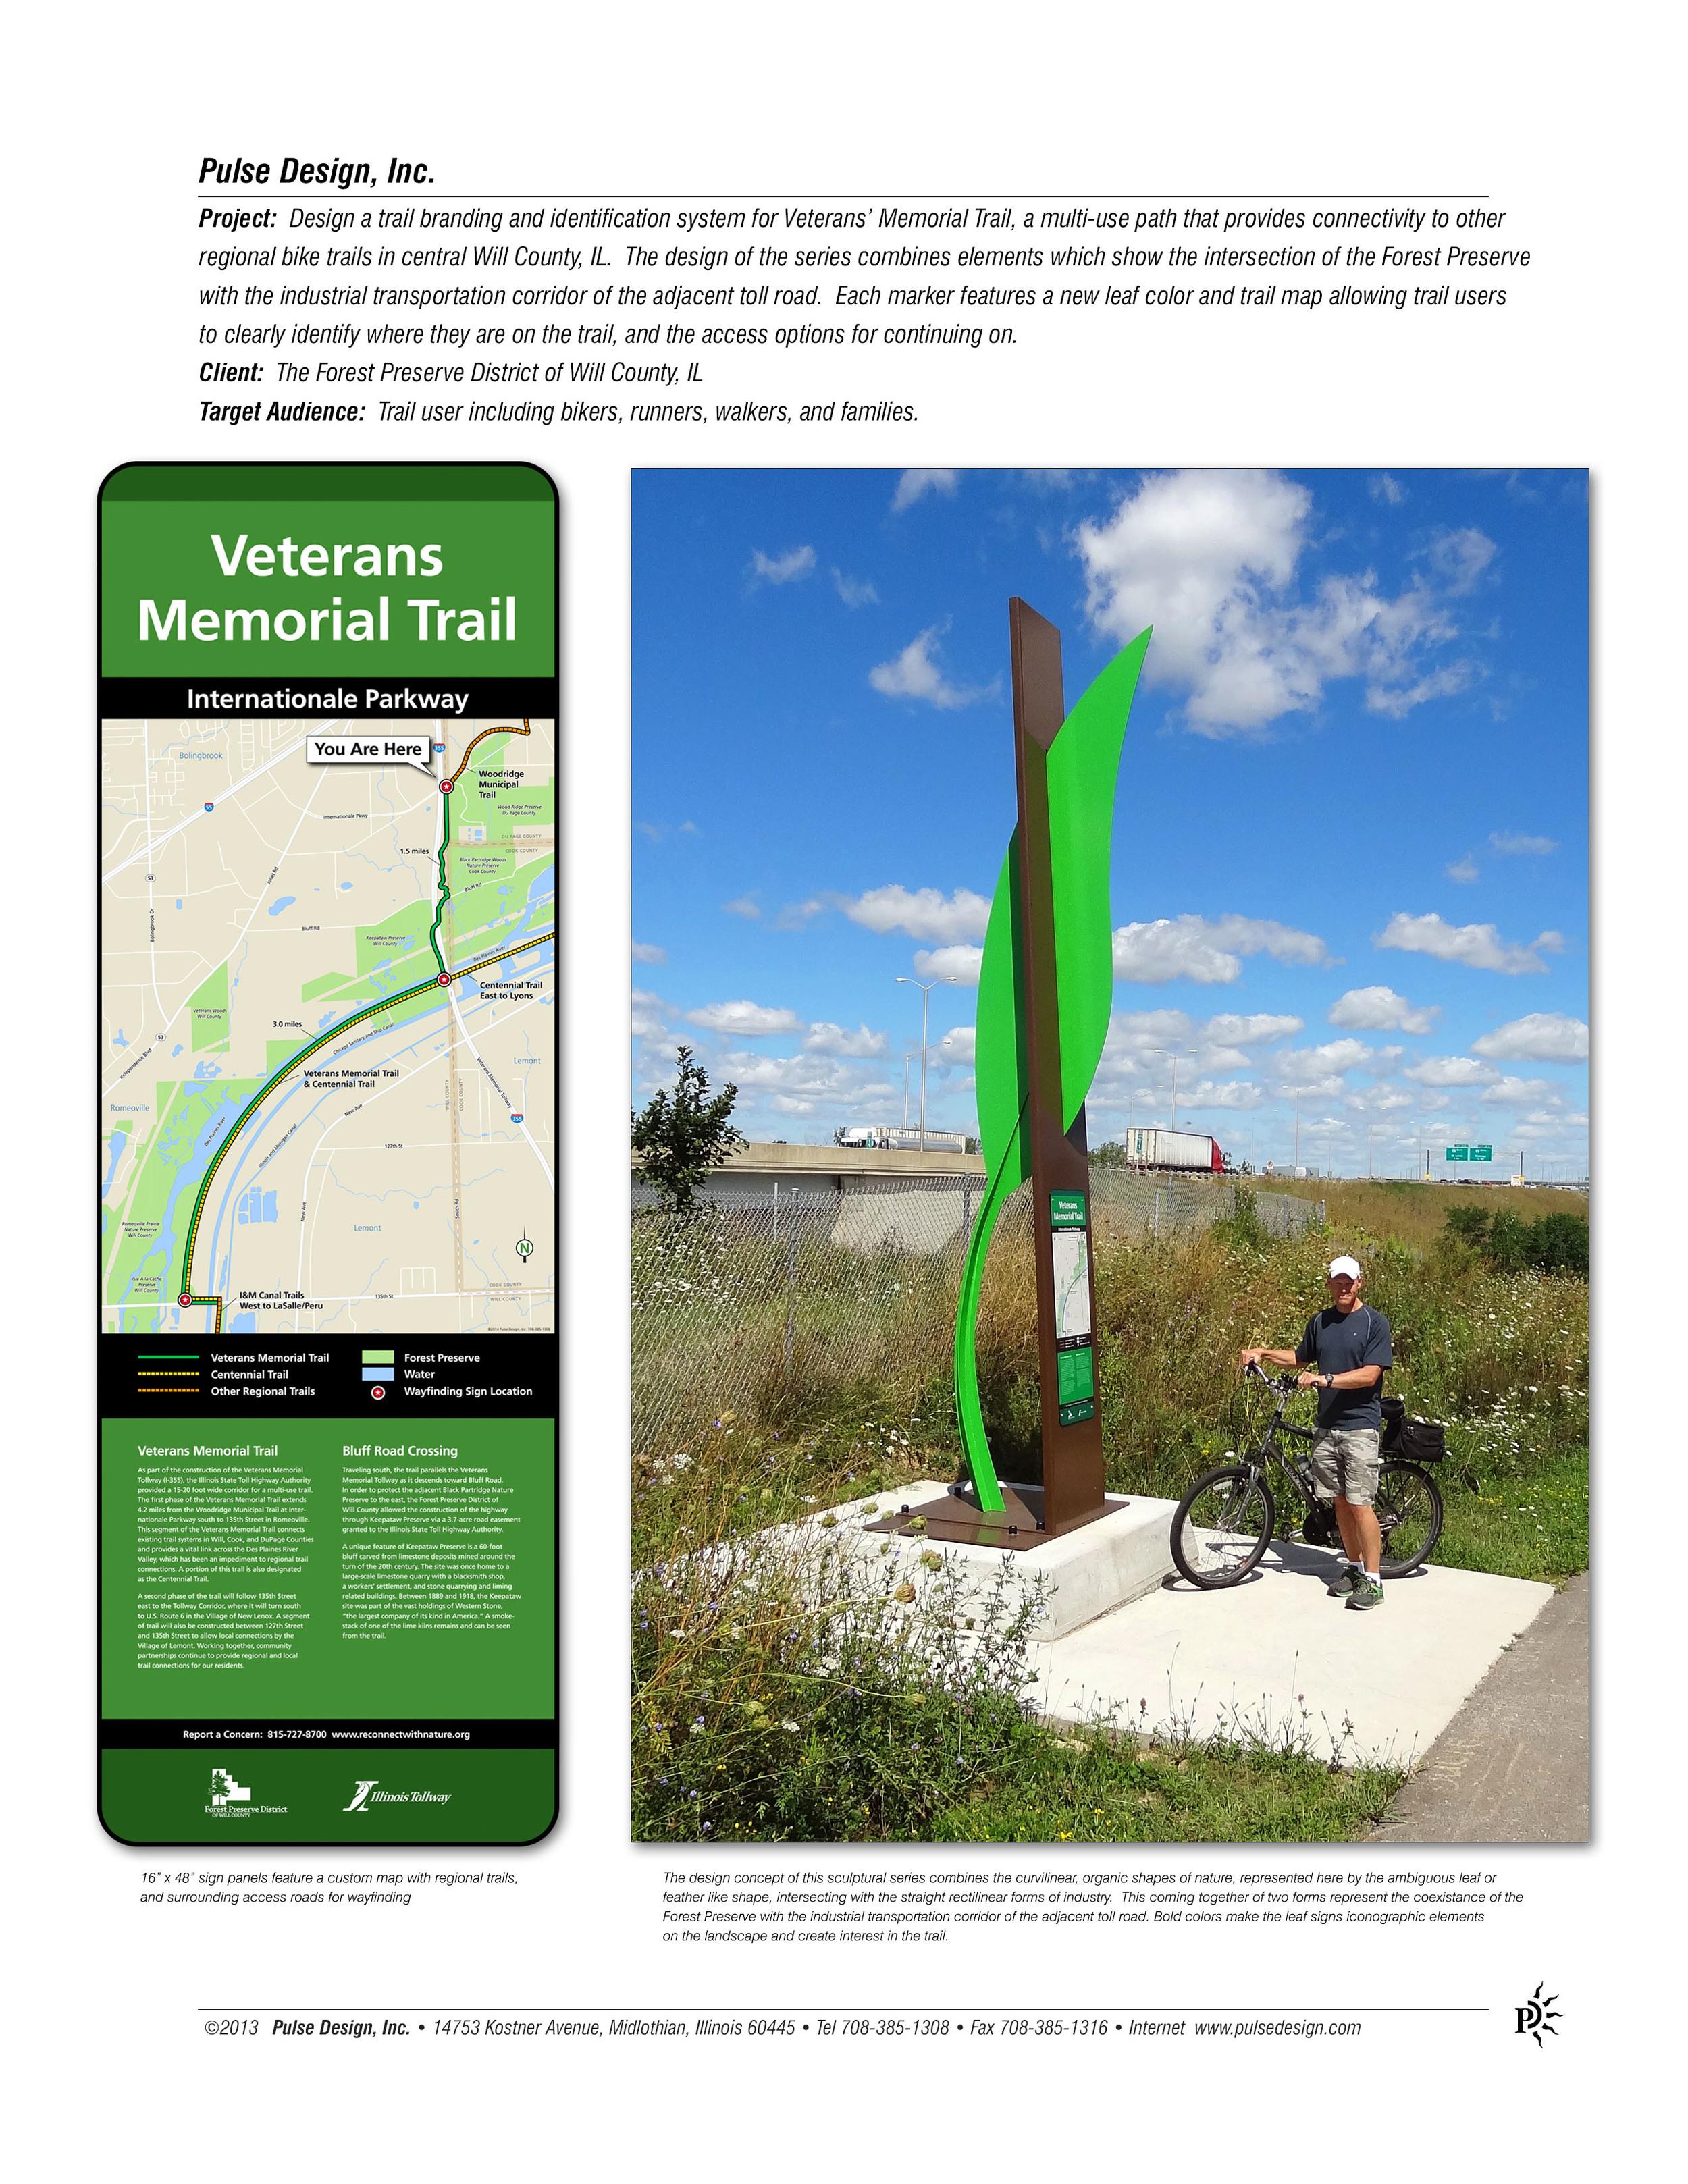 Veterans-Memorial-Trail-Sign-Photo-Green-Pulse-Design-Inc.jpg